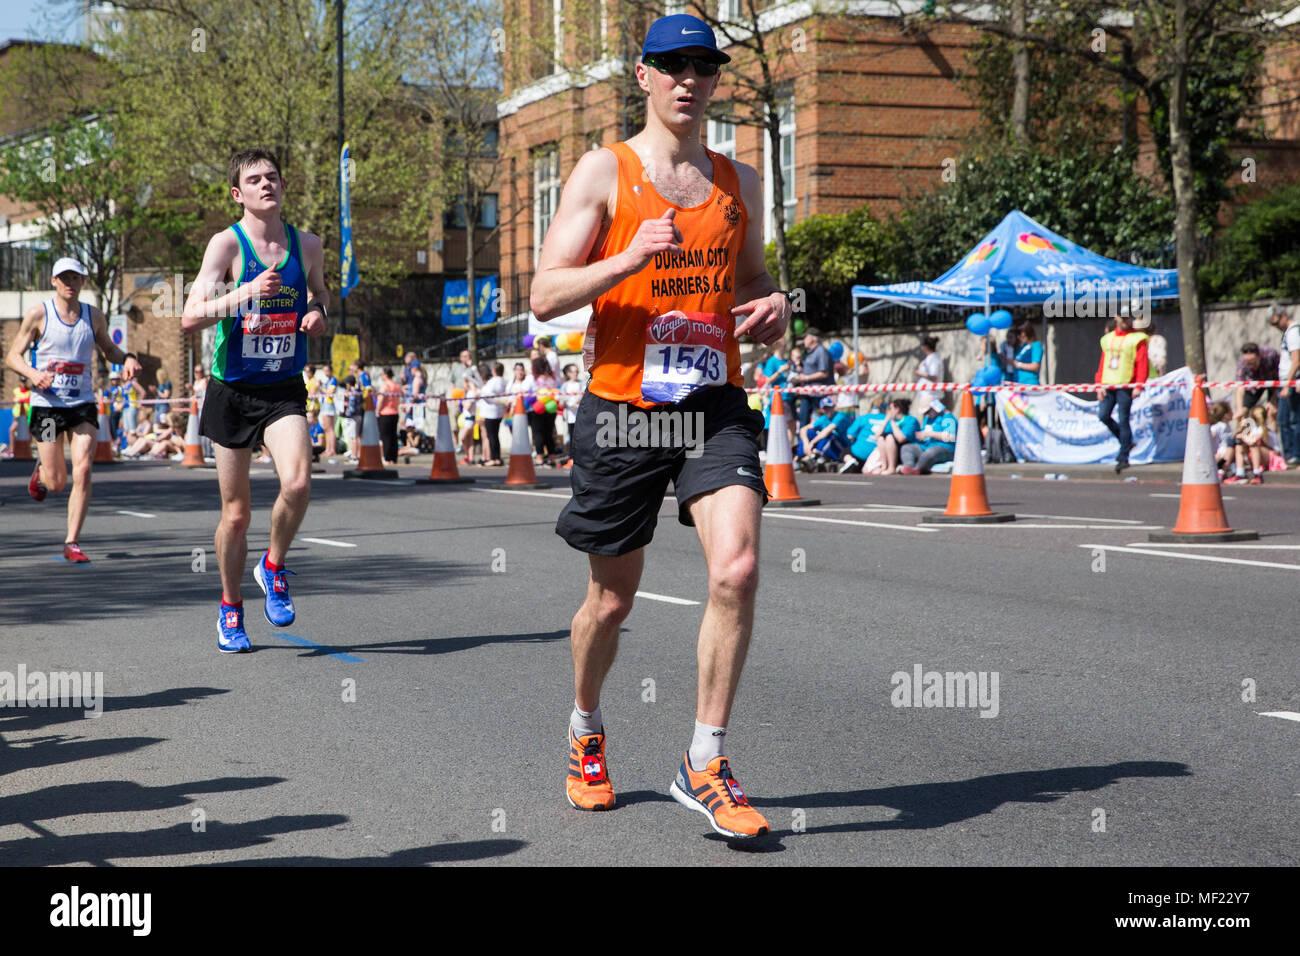 London Uk 22nd April 2018 Matthew Hornsby Of Durham City